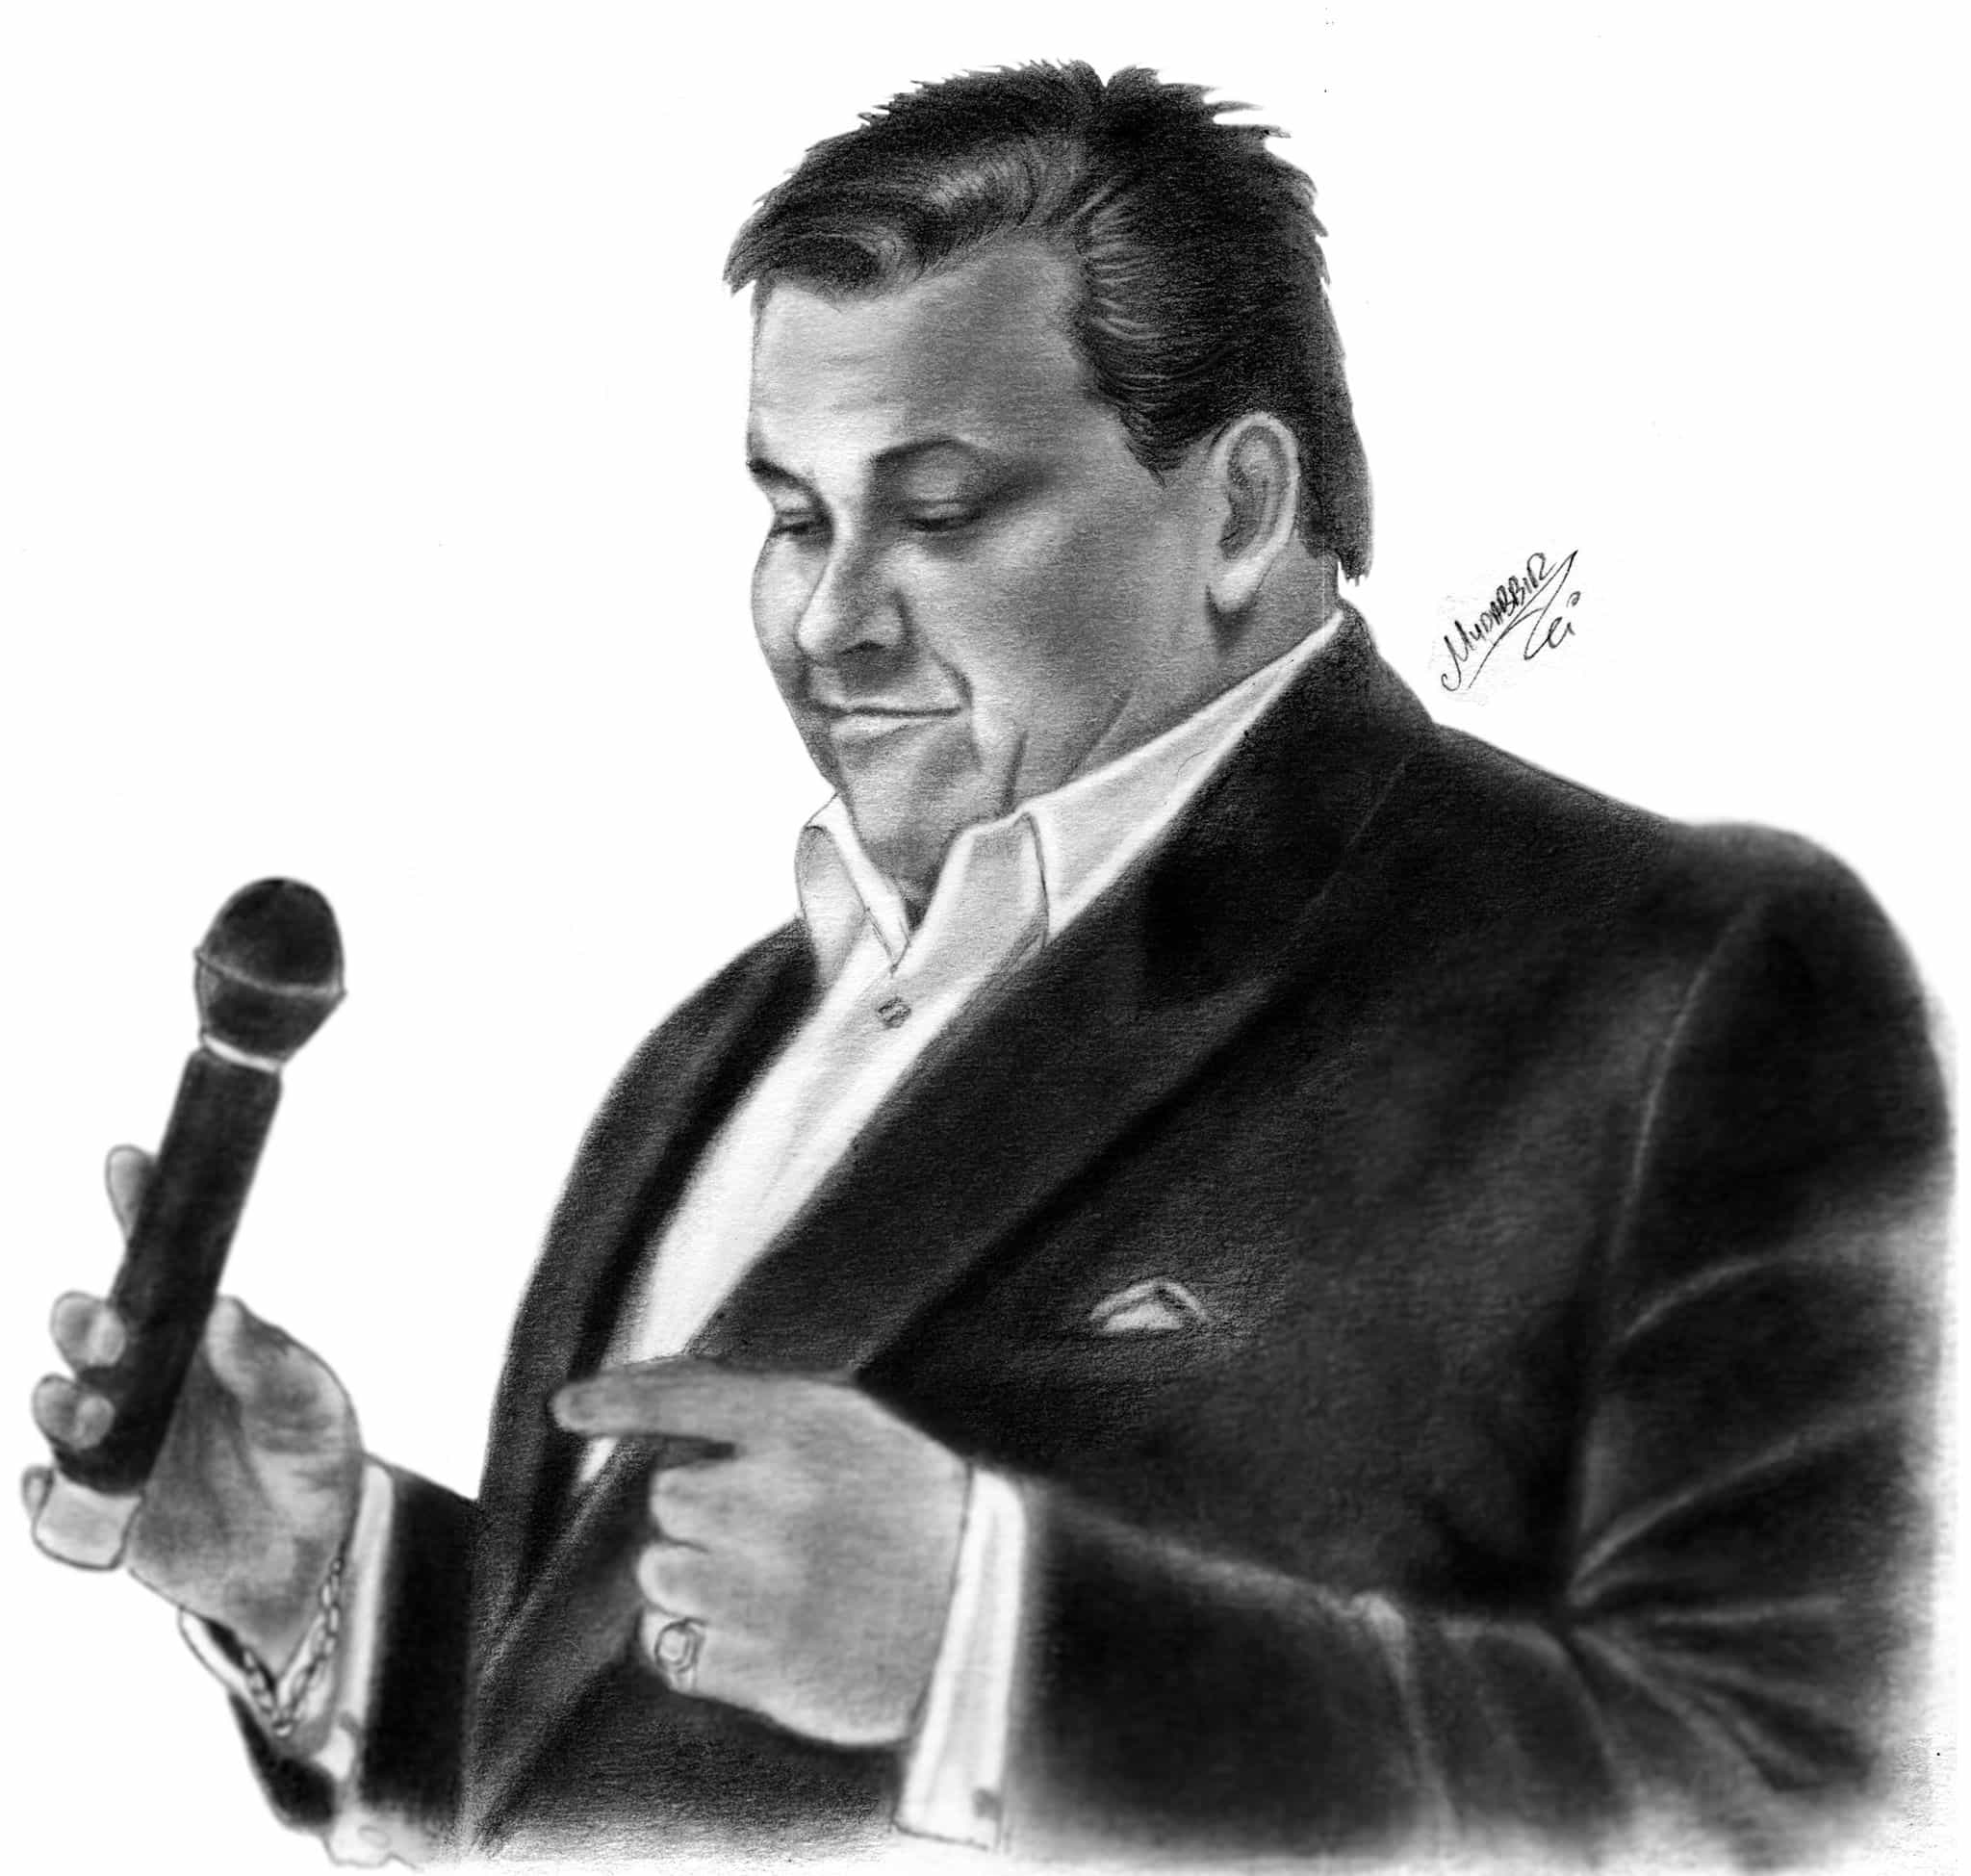 Sal the Singer